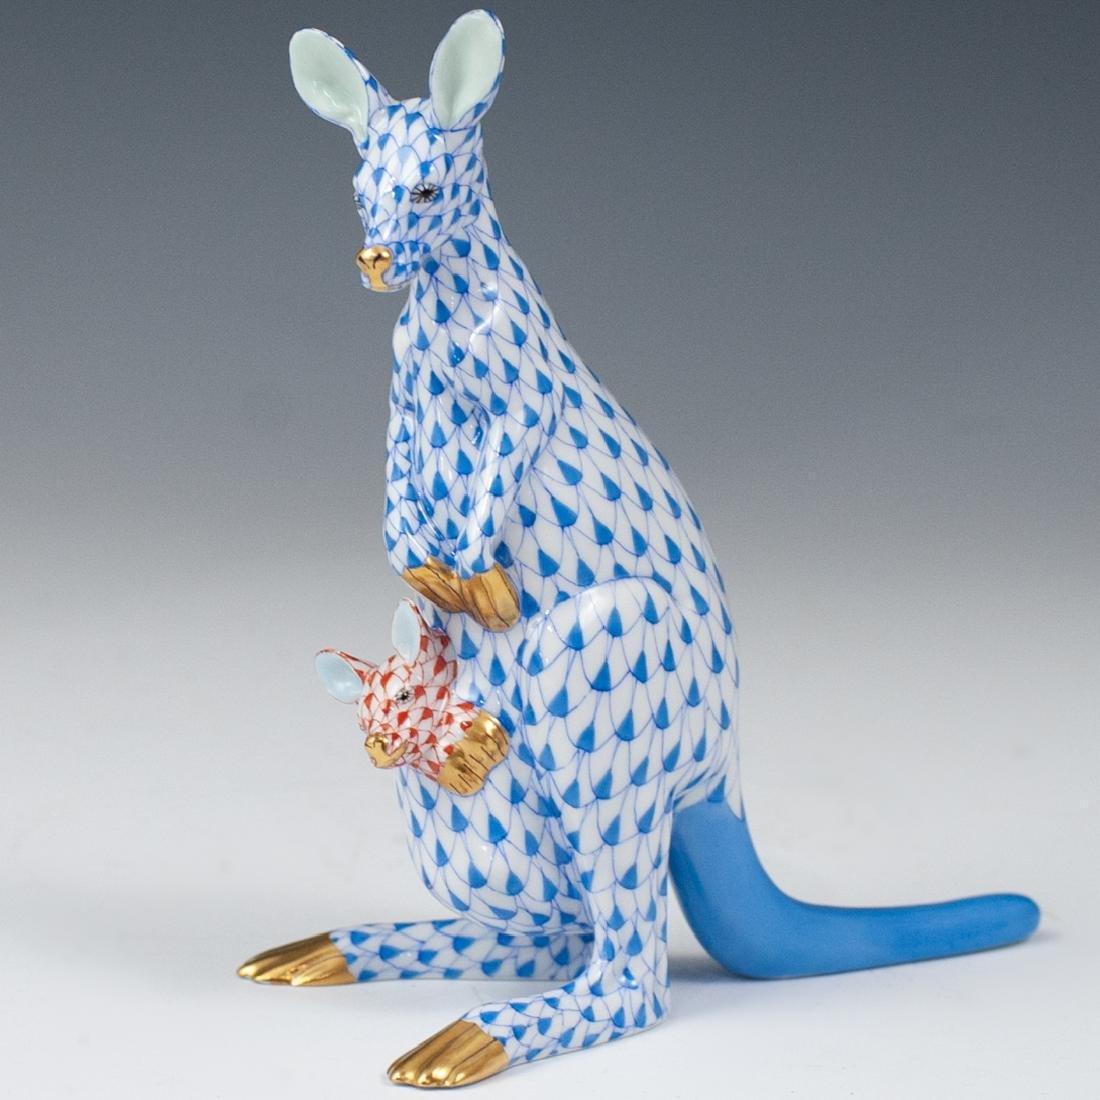 Herend Porcelain Kangaroo